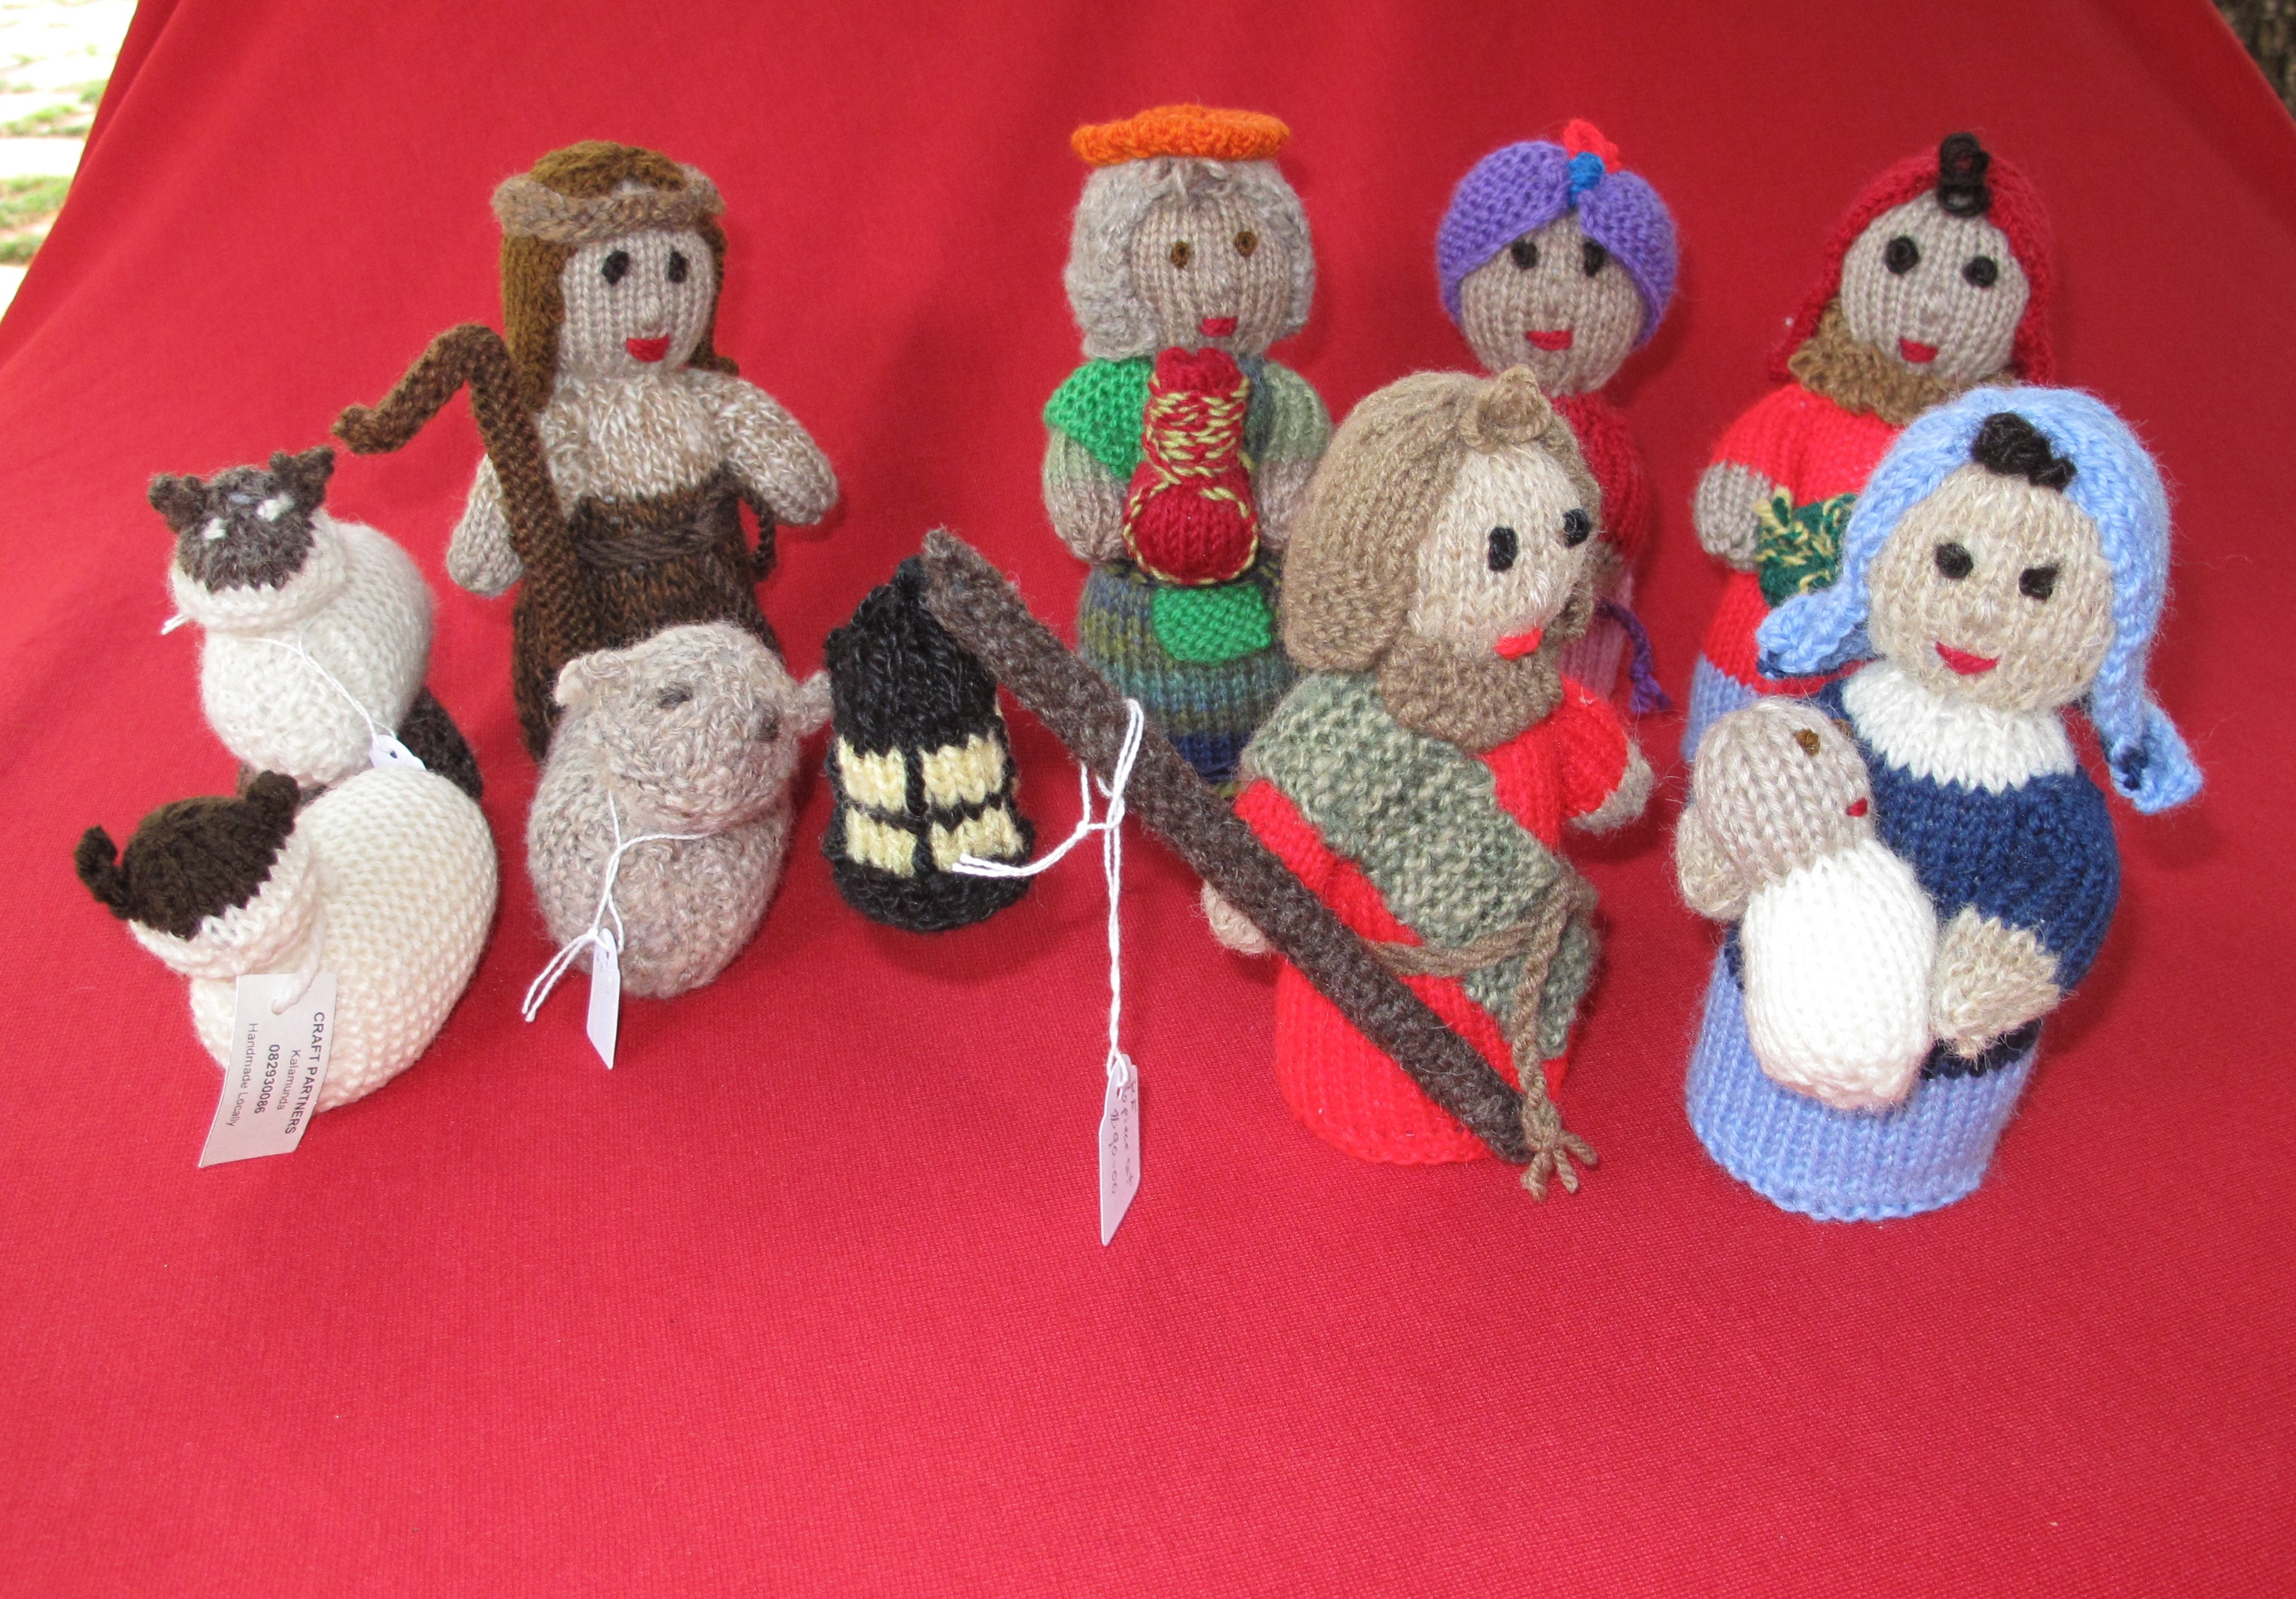 Hand knitted nativity set